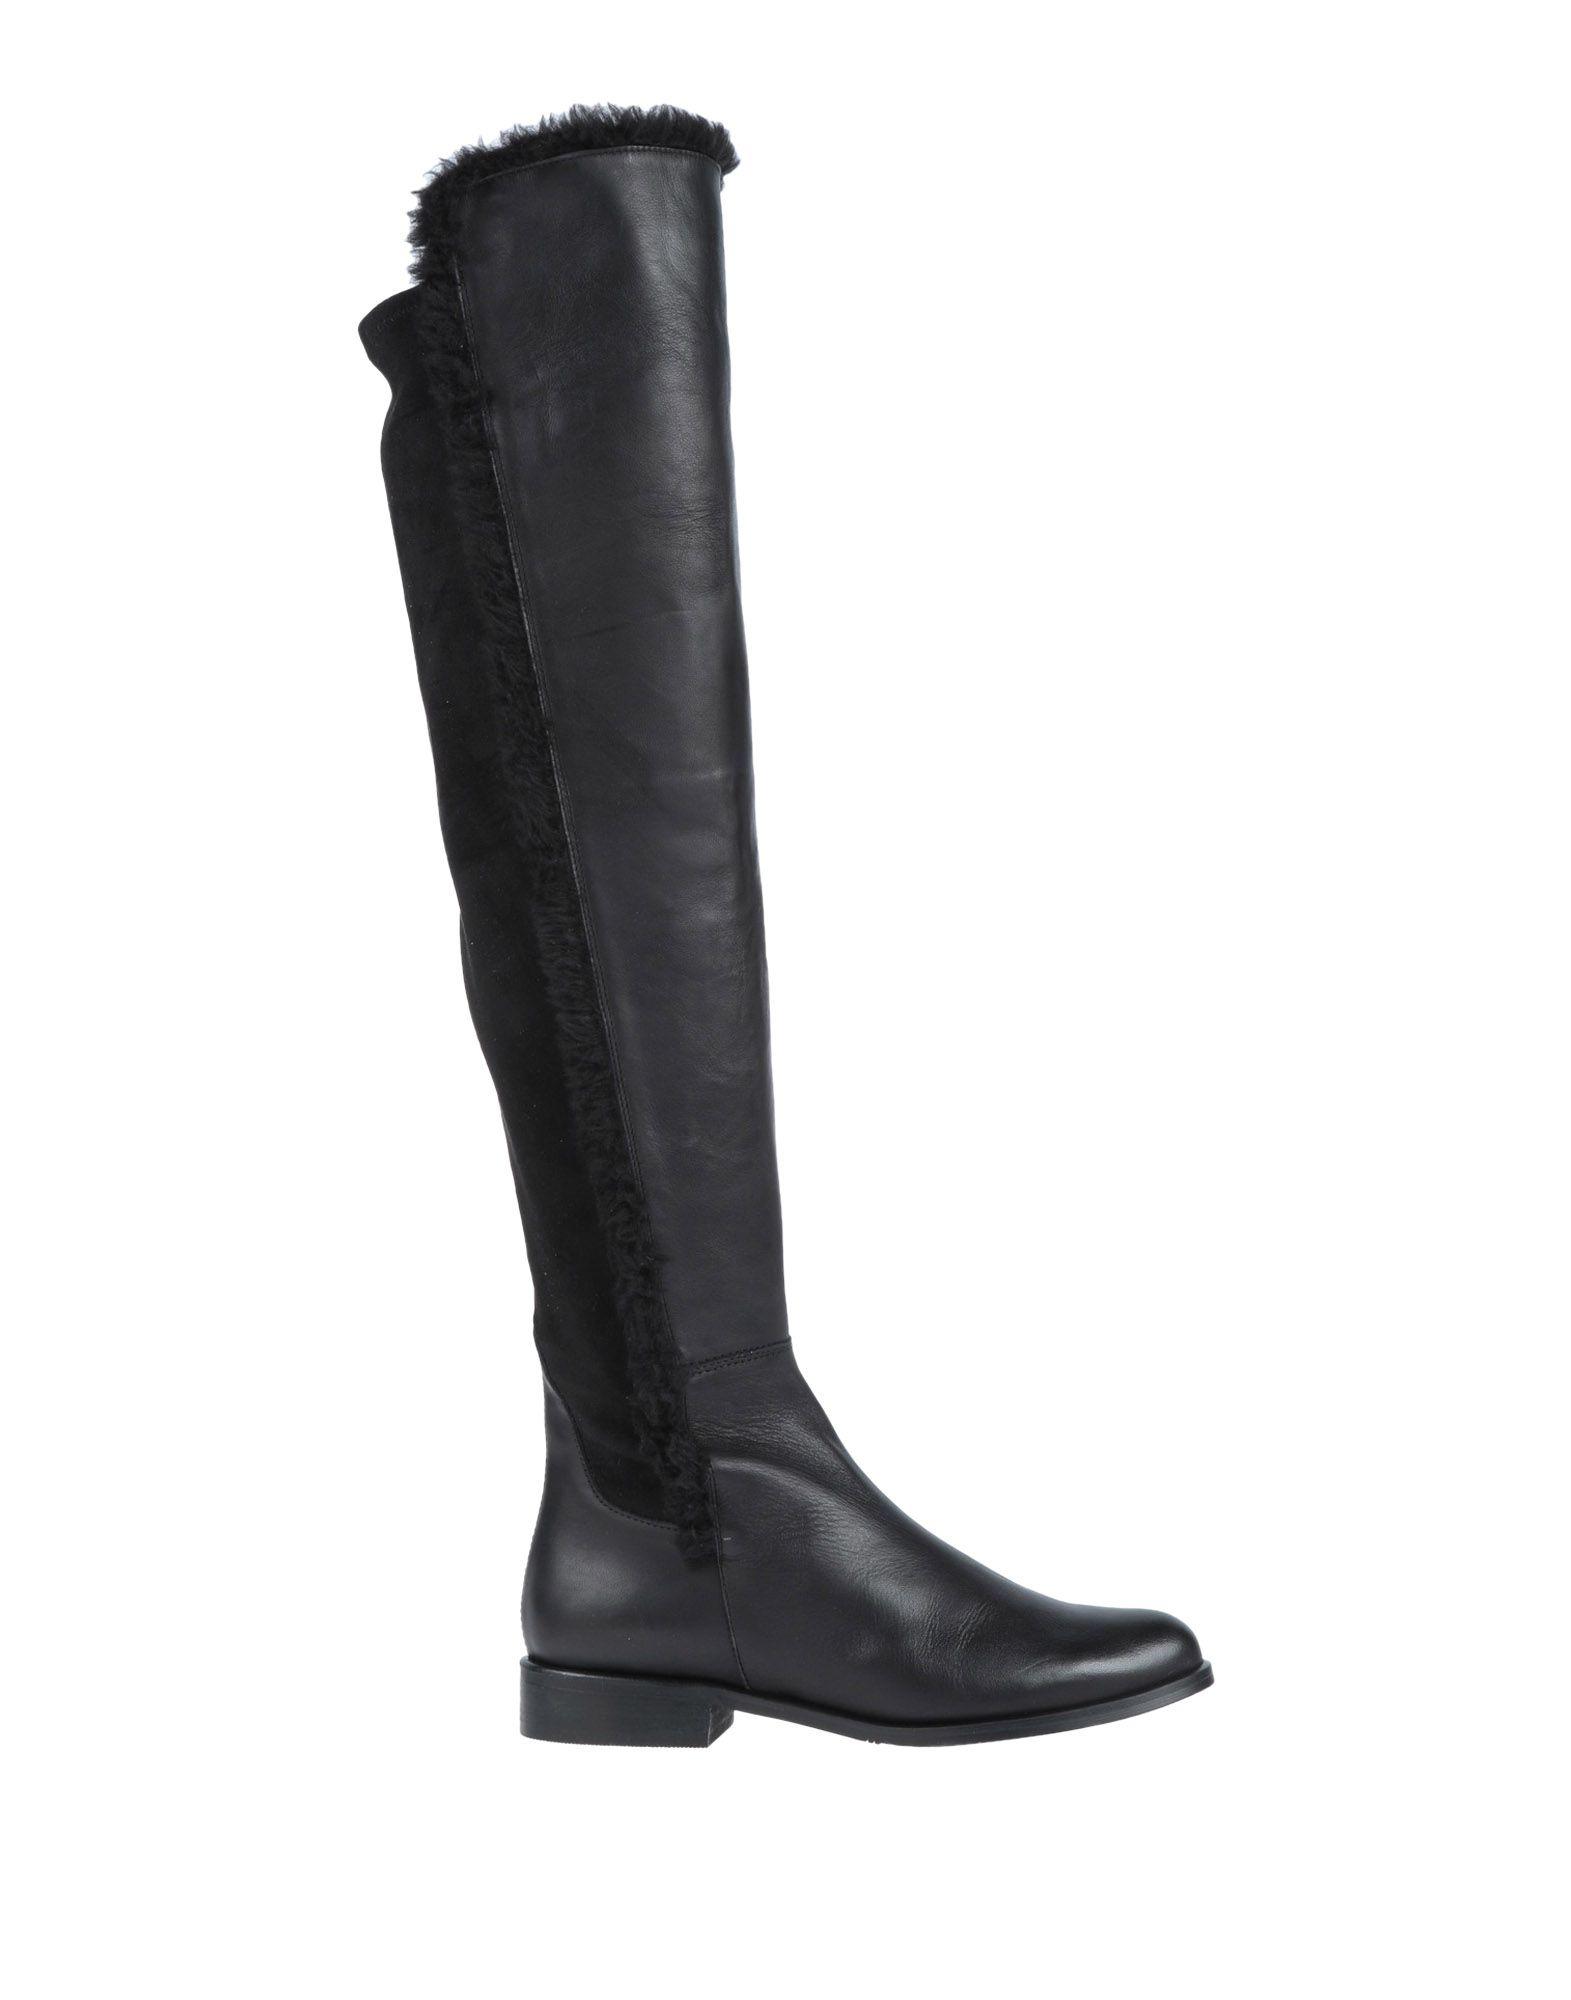 Moda Stivali Marian Donna - 11511782QG 11511782QG - cb7b65